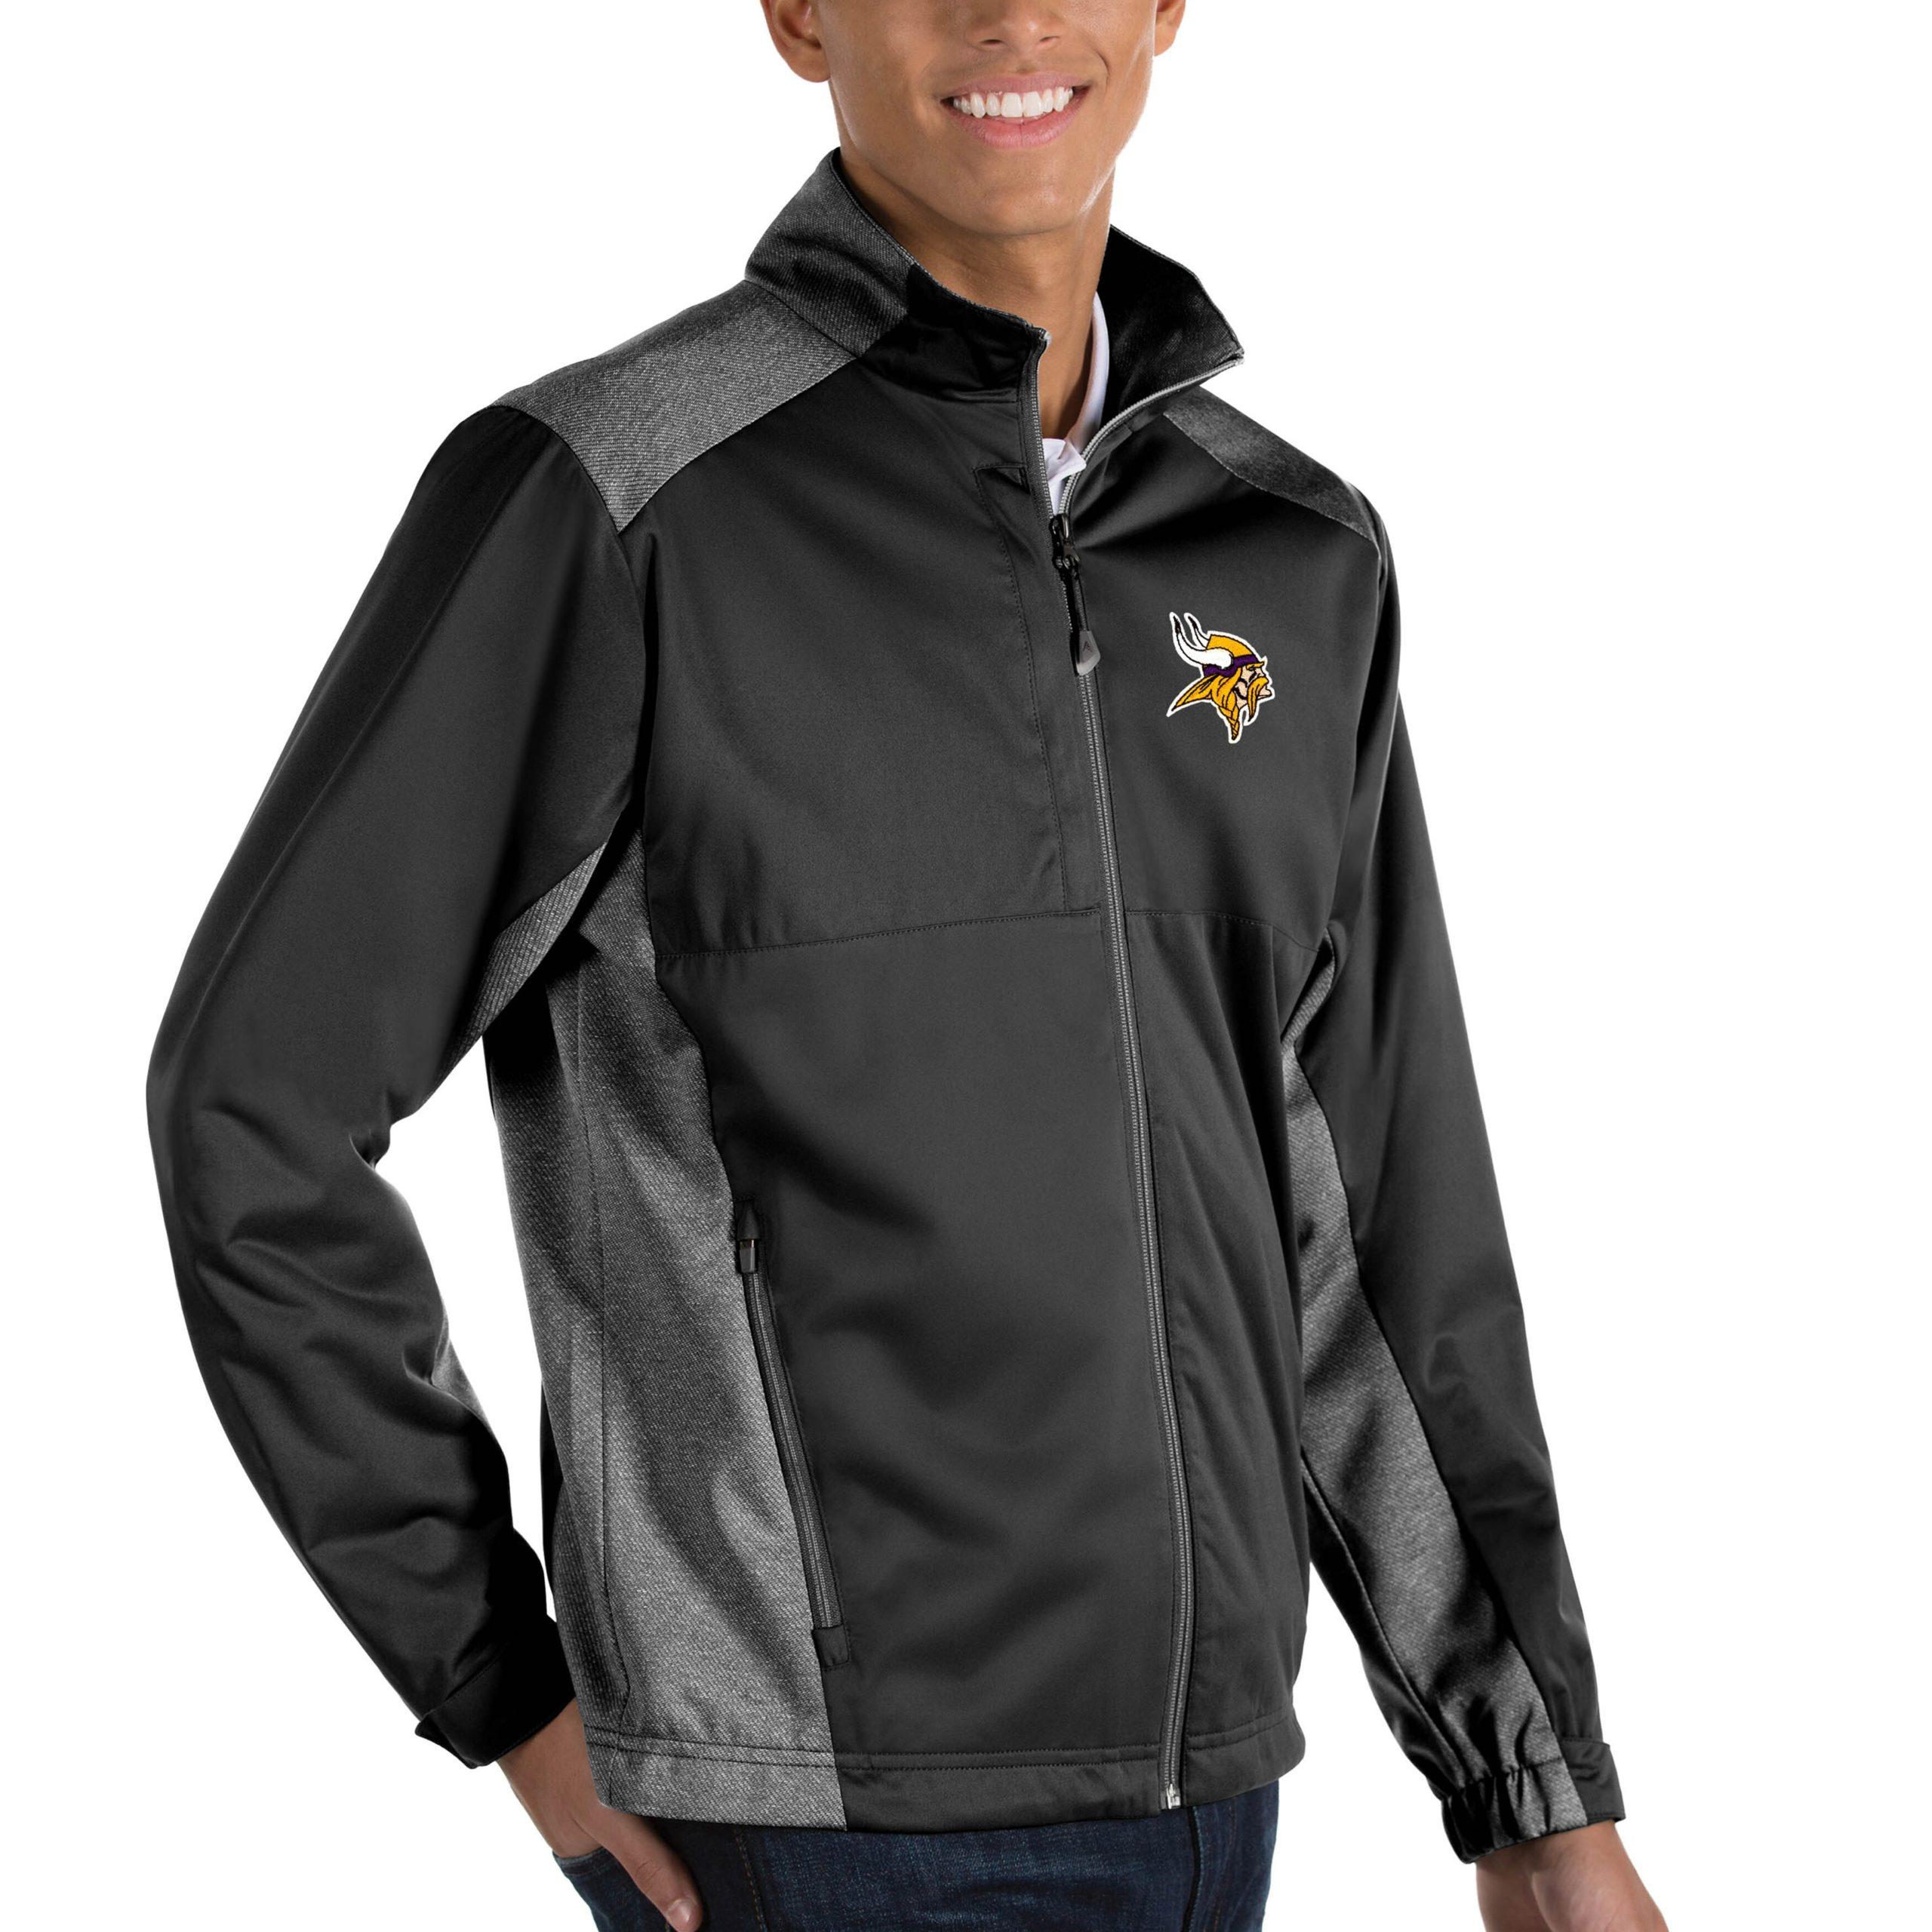 Minnesota Vikings Antigua Revolve Big & Tall Full-Zip Jacket - Heather Black